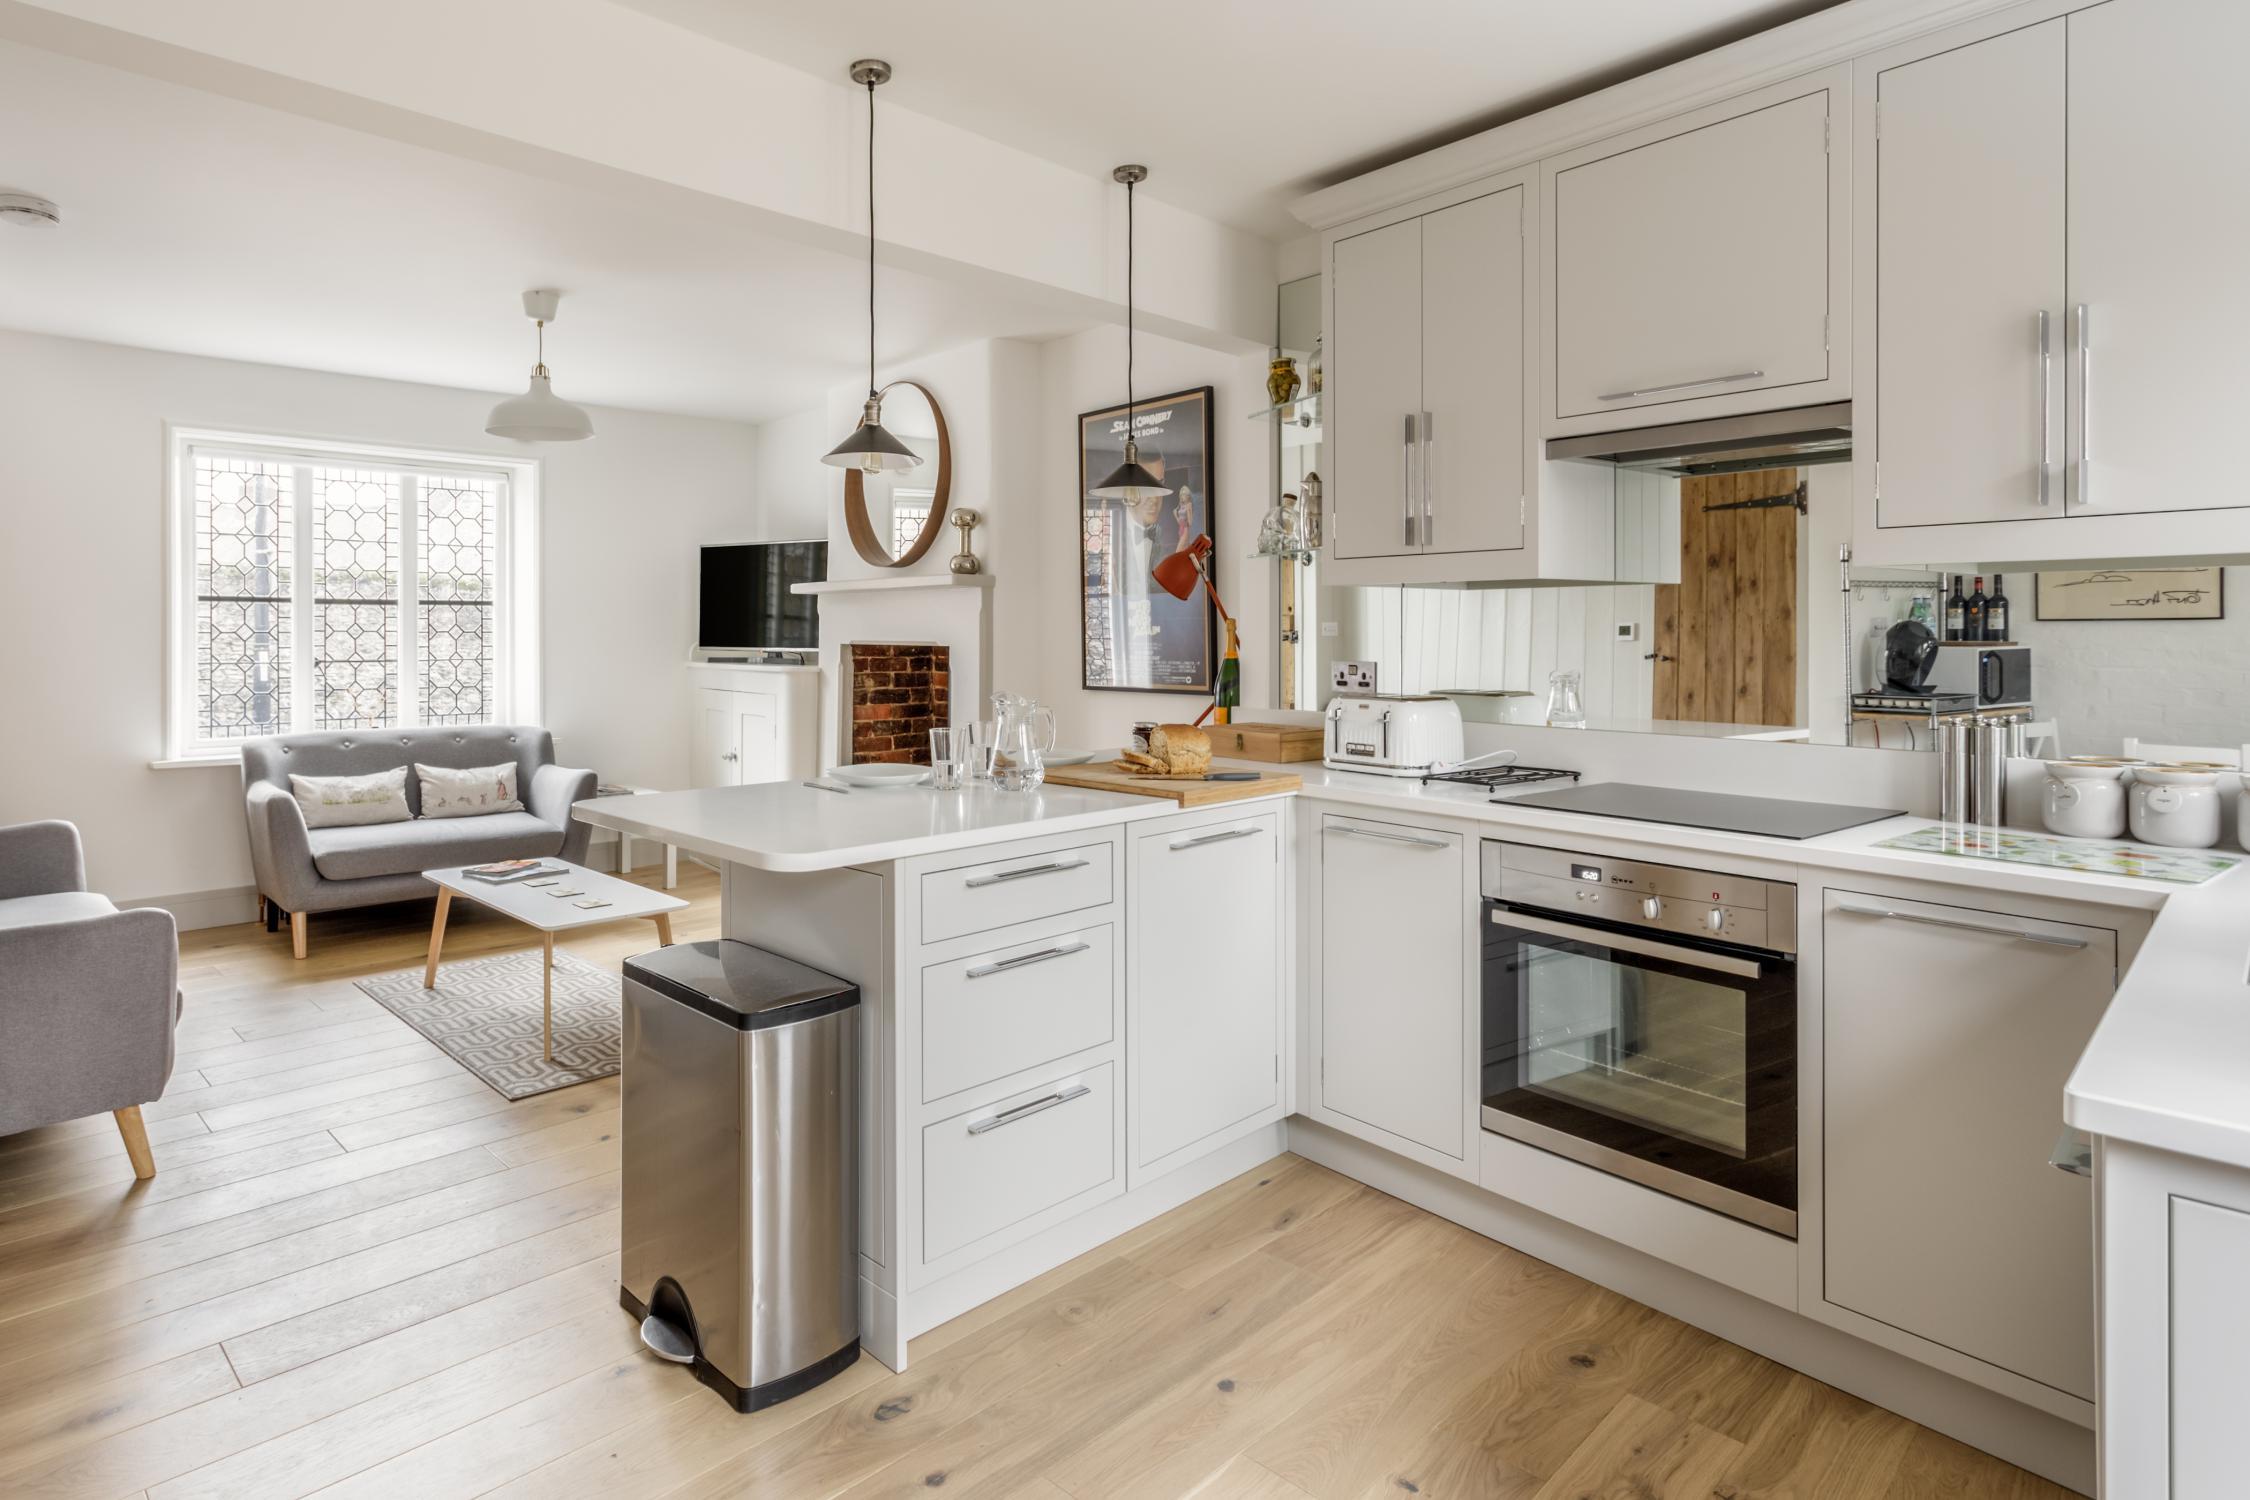 Worthing Builders-ExtraOrdinaryRooms-Arundel renovation open plan living.jpg